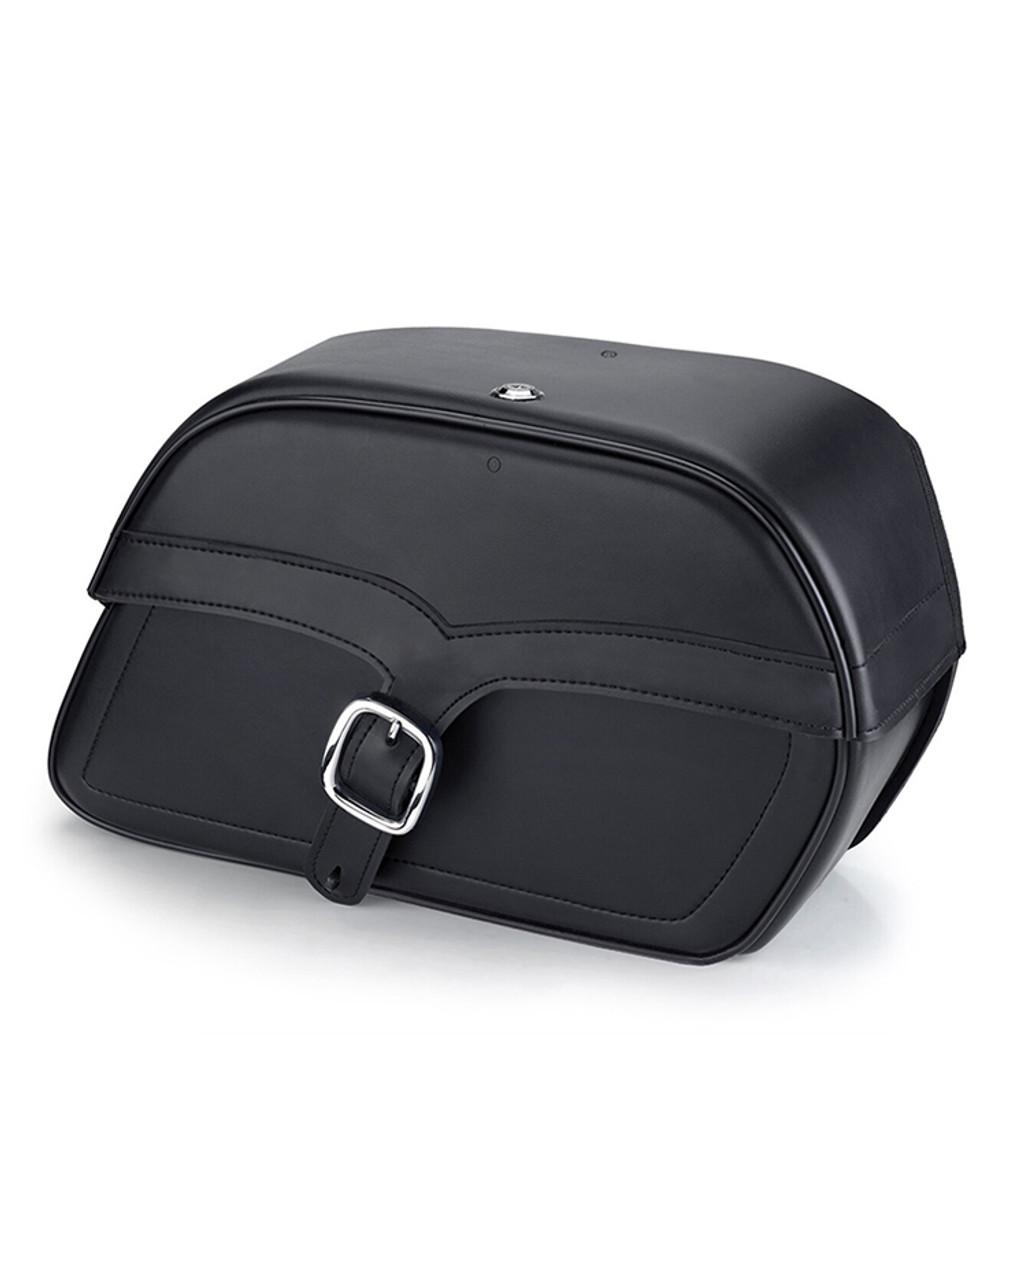 Honda 1100 Shadow Sabre Charger Single Strap Large Motorcycle Saddlebags bag view